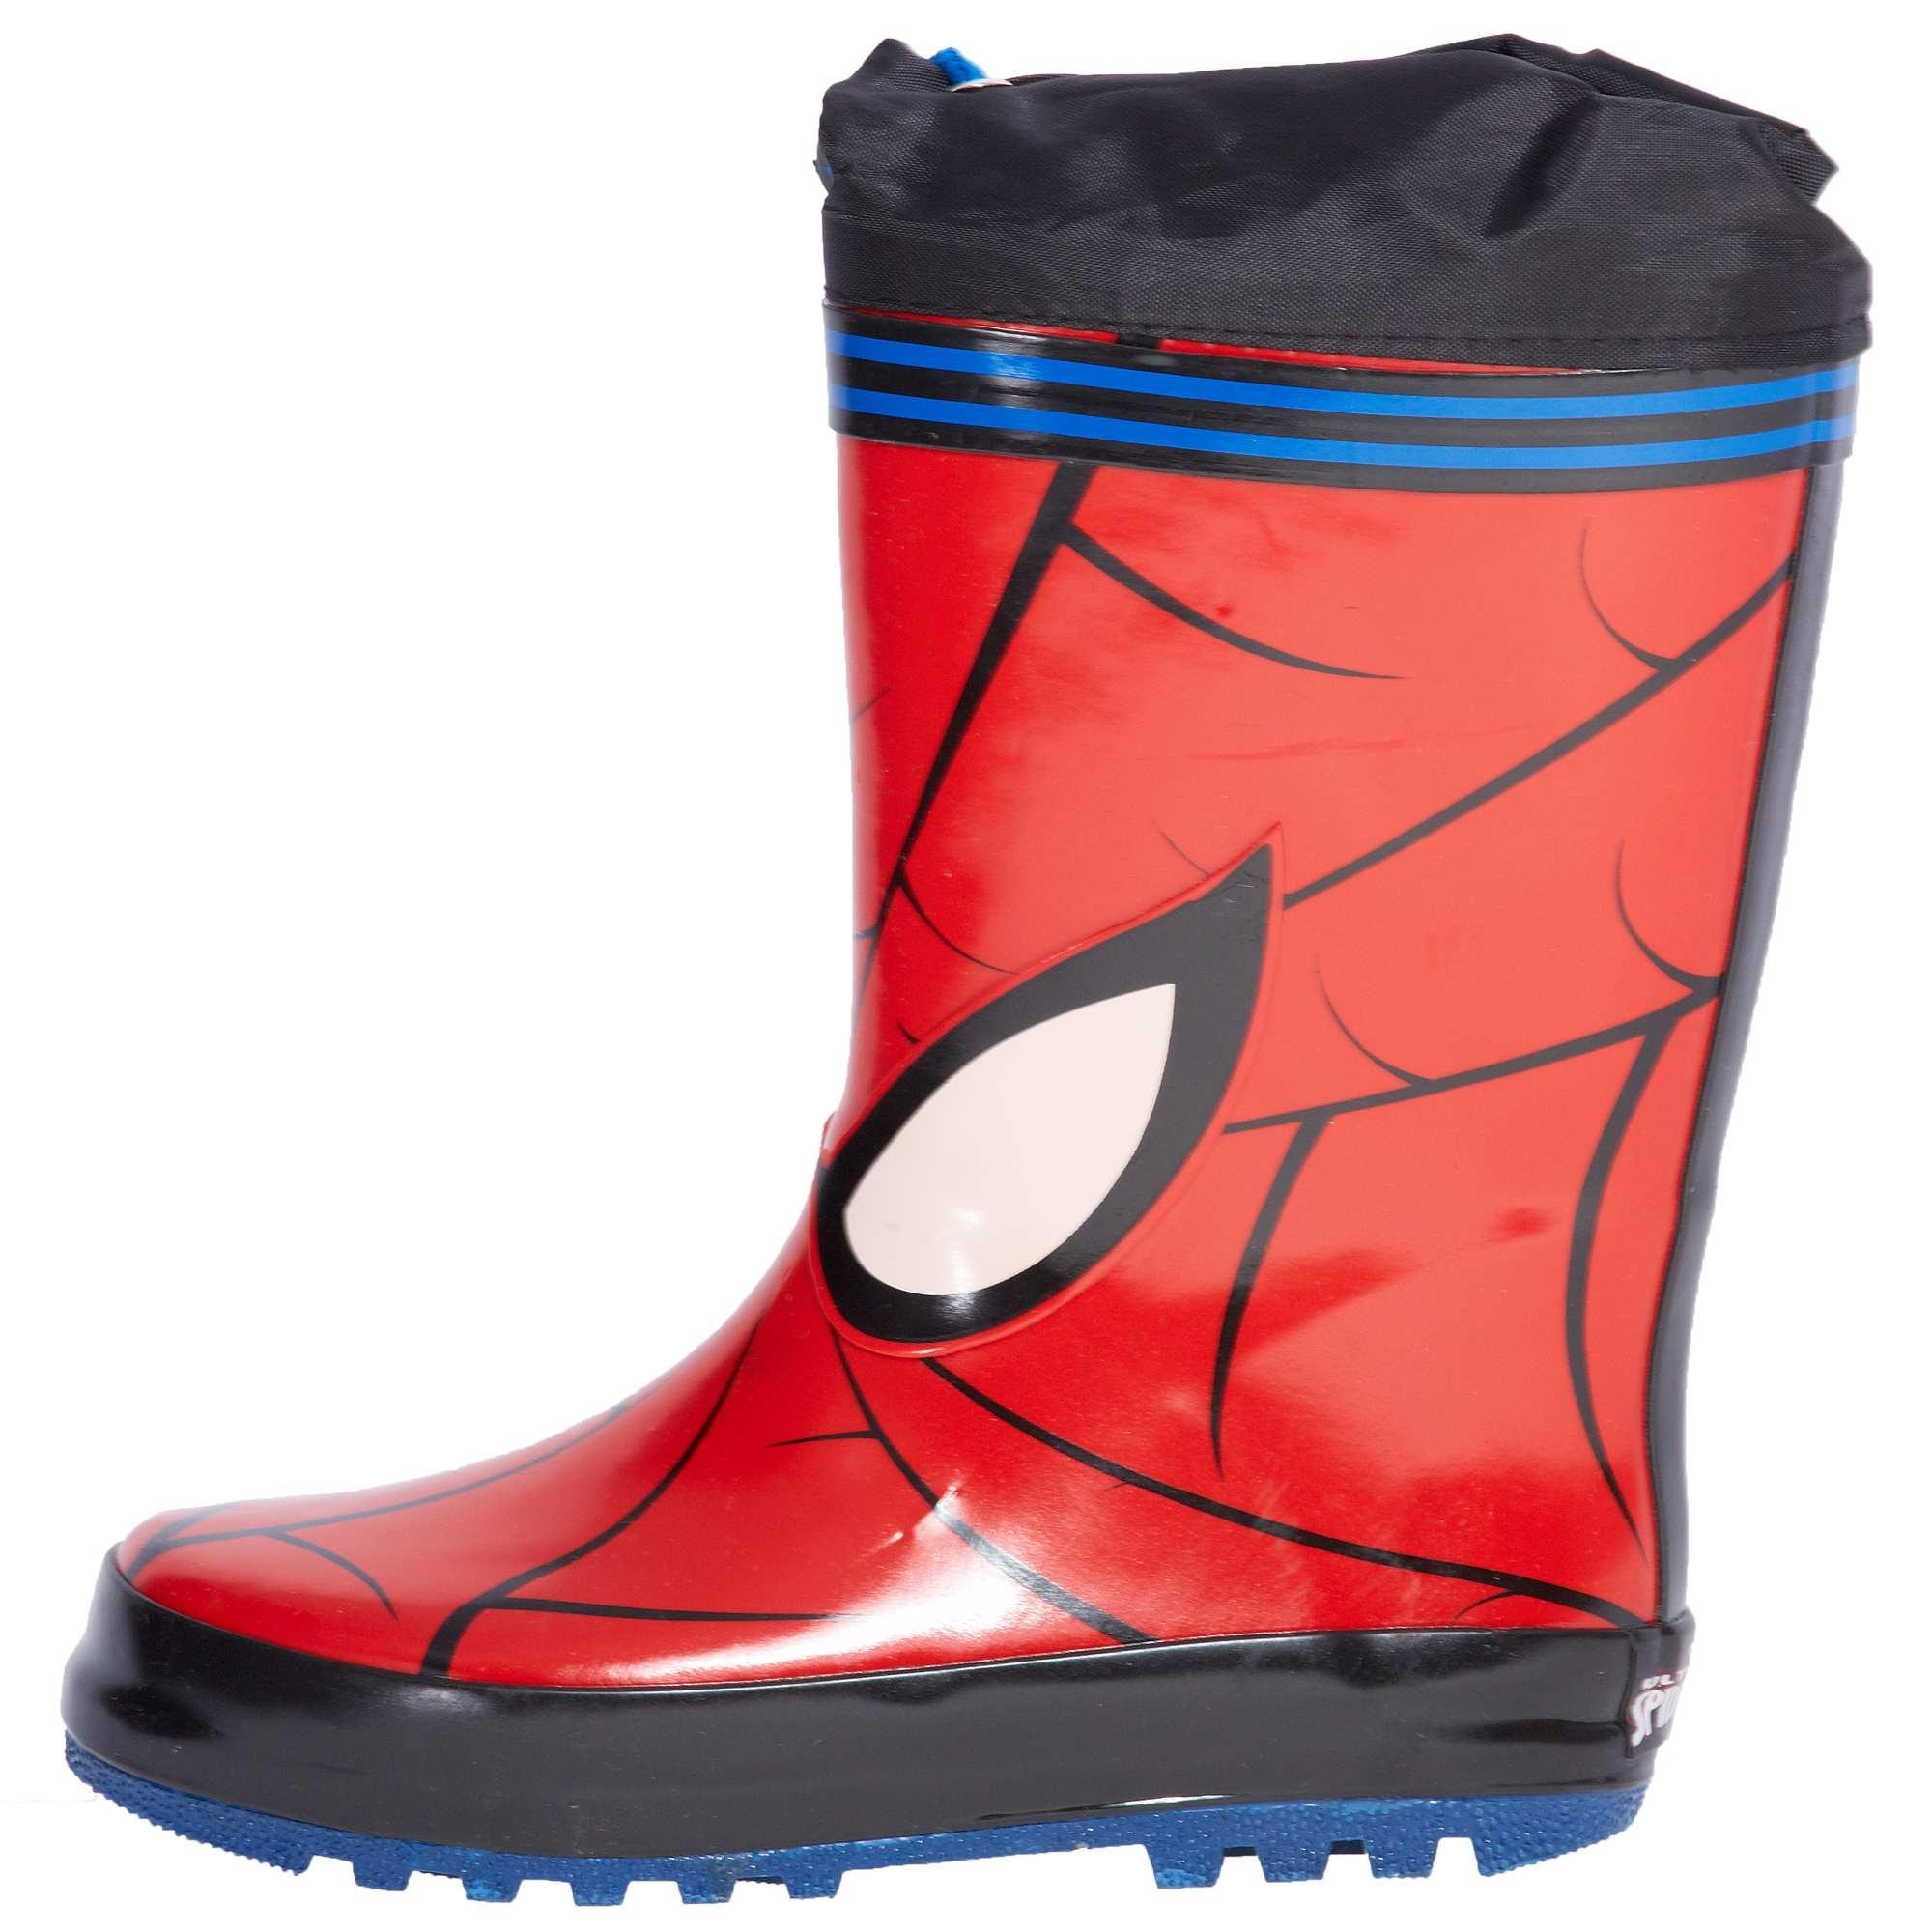 stivali pioggia bambino kiabi spiderman 16,99 euro